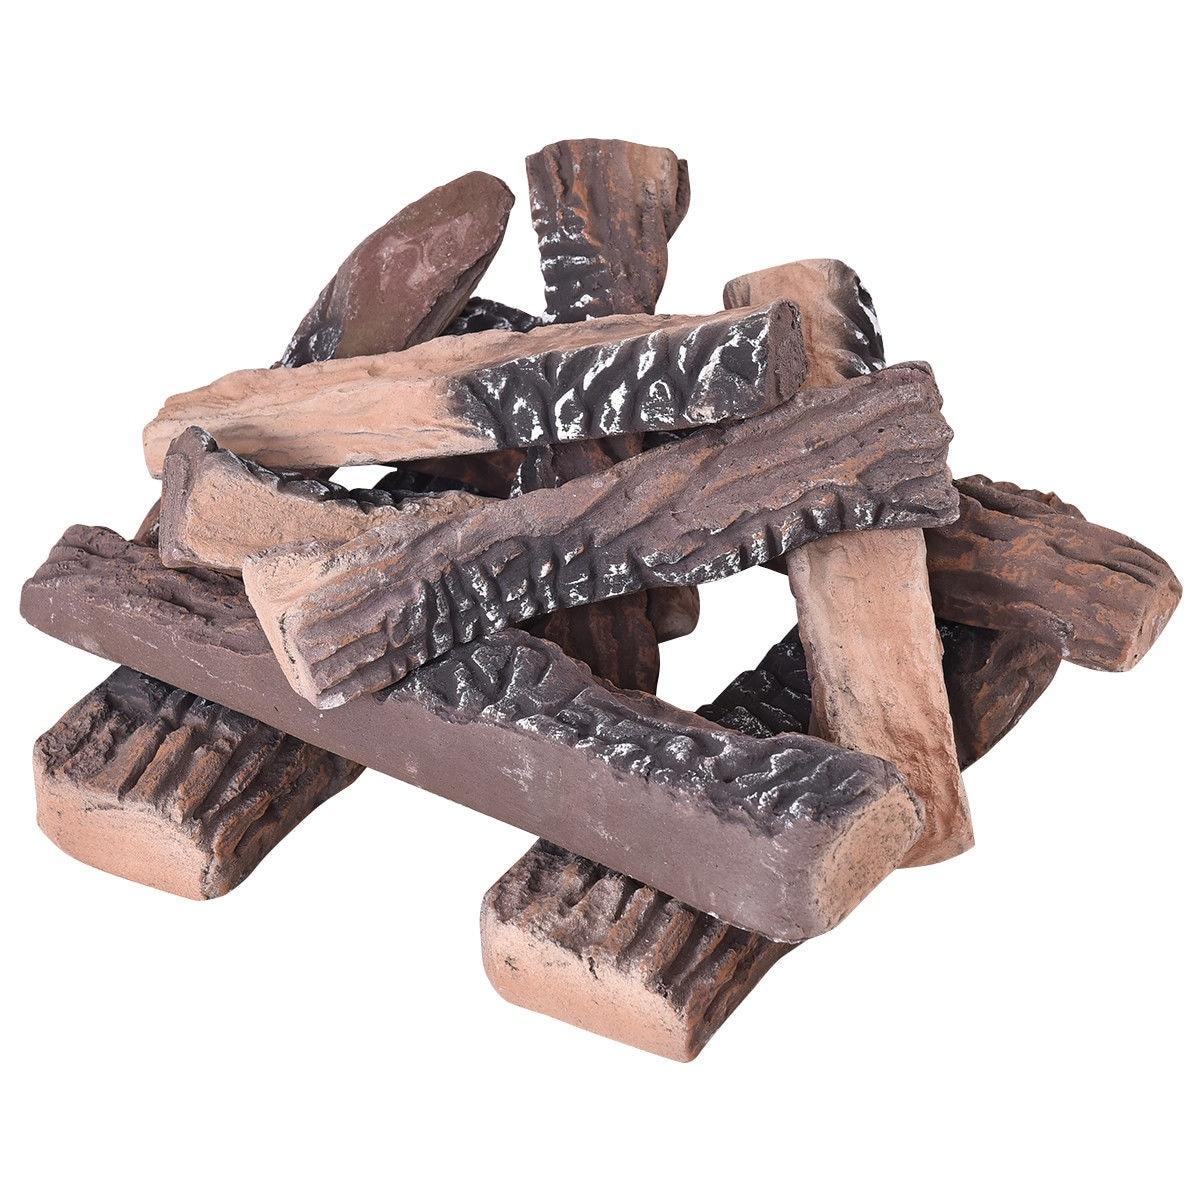 Shop Costway 10PCS Ceramic Wood Logs Gas Fireplace Imitation Wood Propane Firepit  Logs - Free Shipping Today - Overstock.com - 18502705 - Shop Costway 10PCS Ceramic Wood Logs Gas Fireplace Imitation Wood